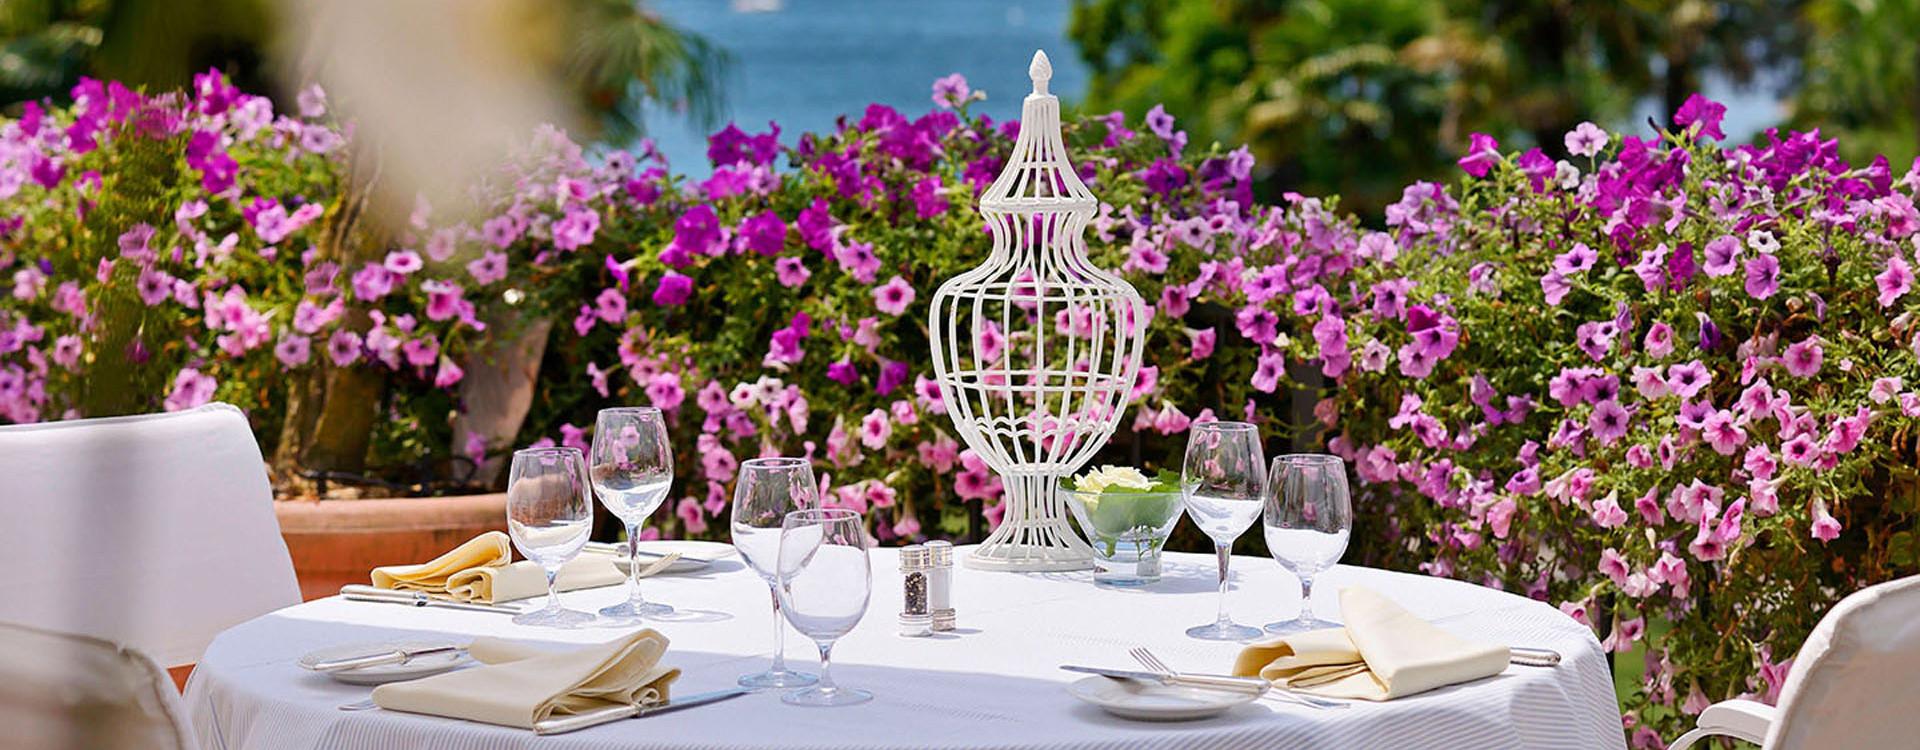 Ресторан Grand Hotel Villa Castagnola